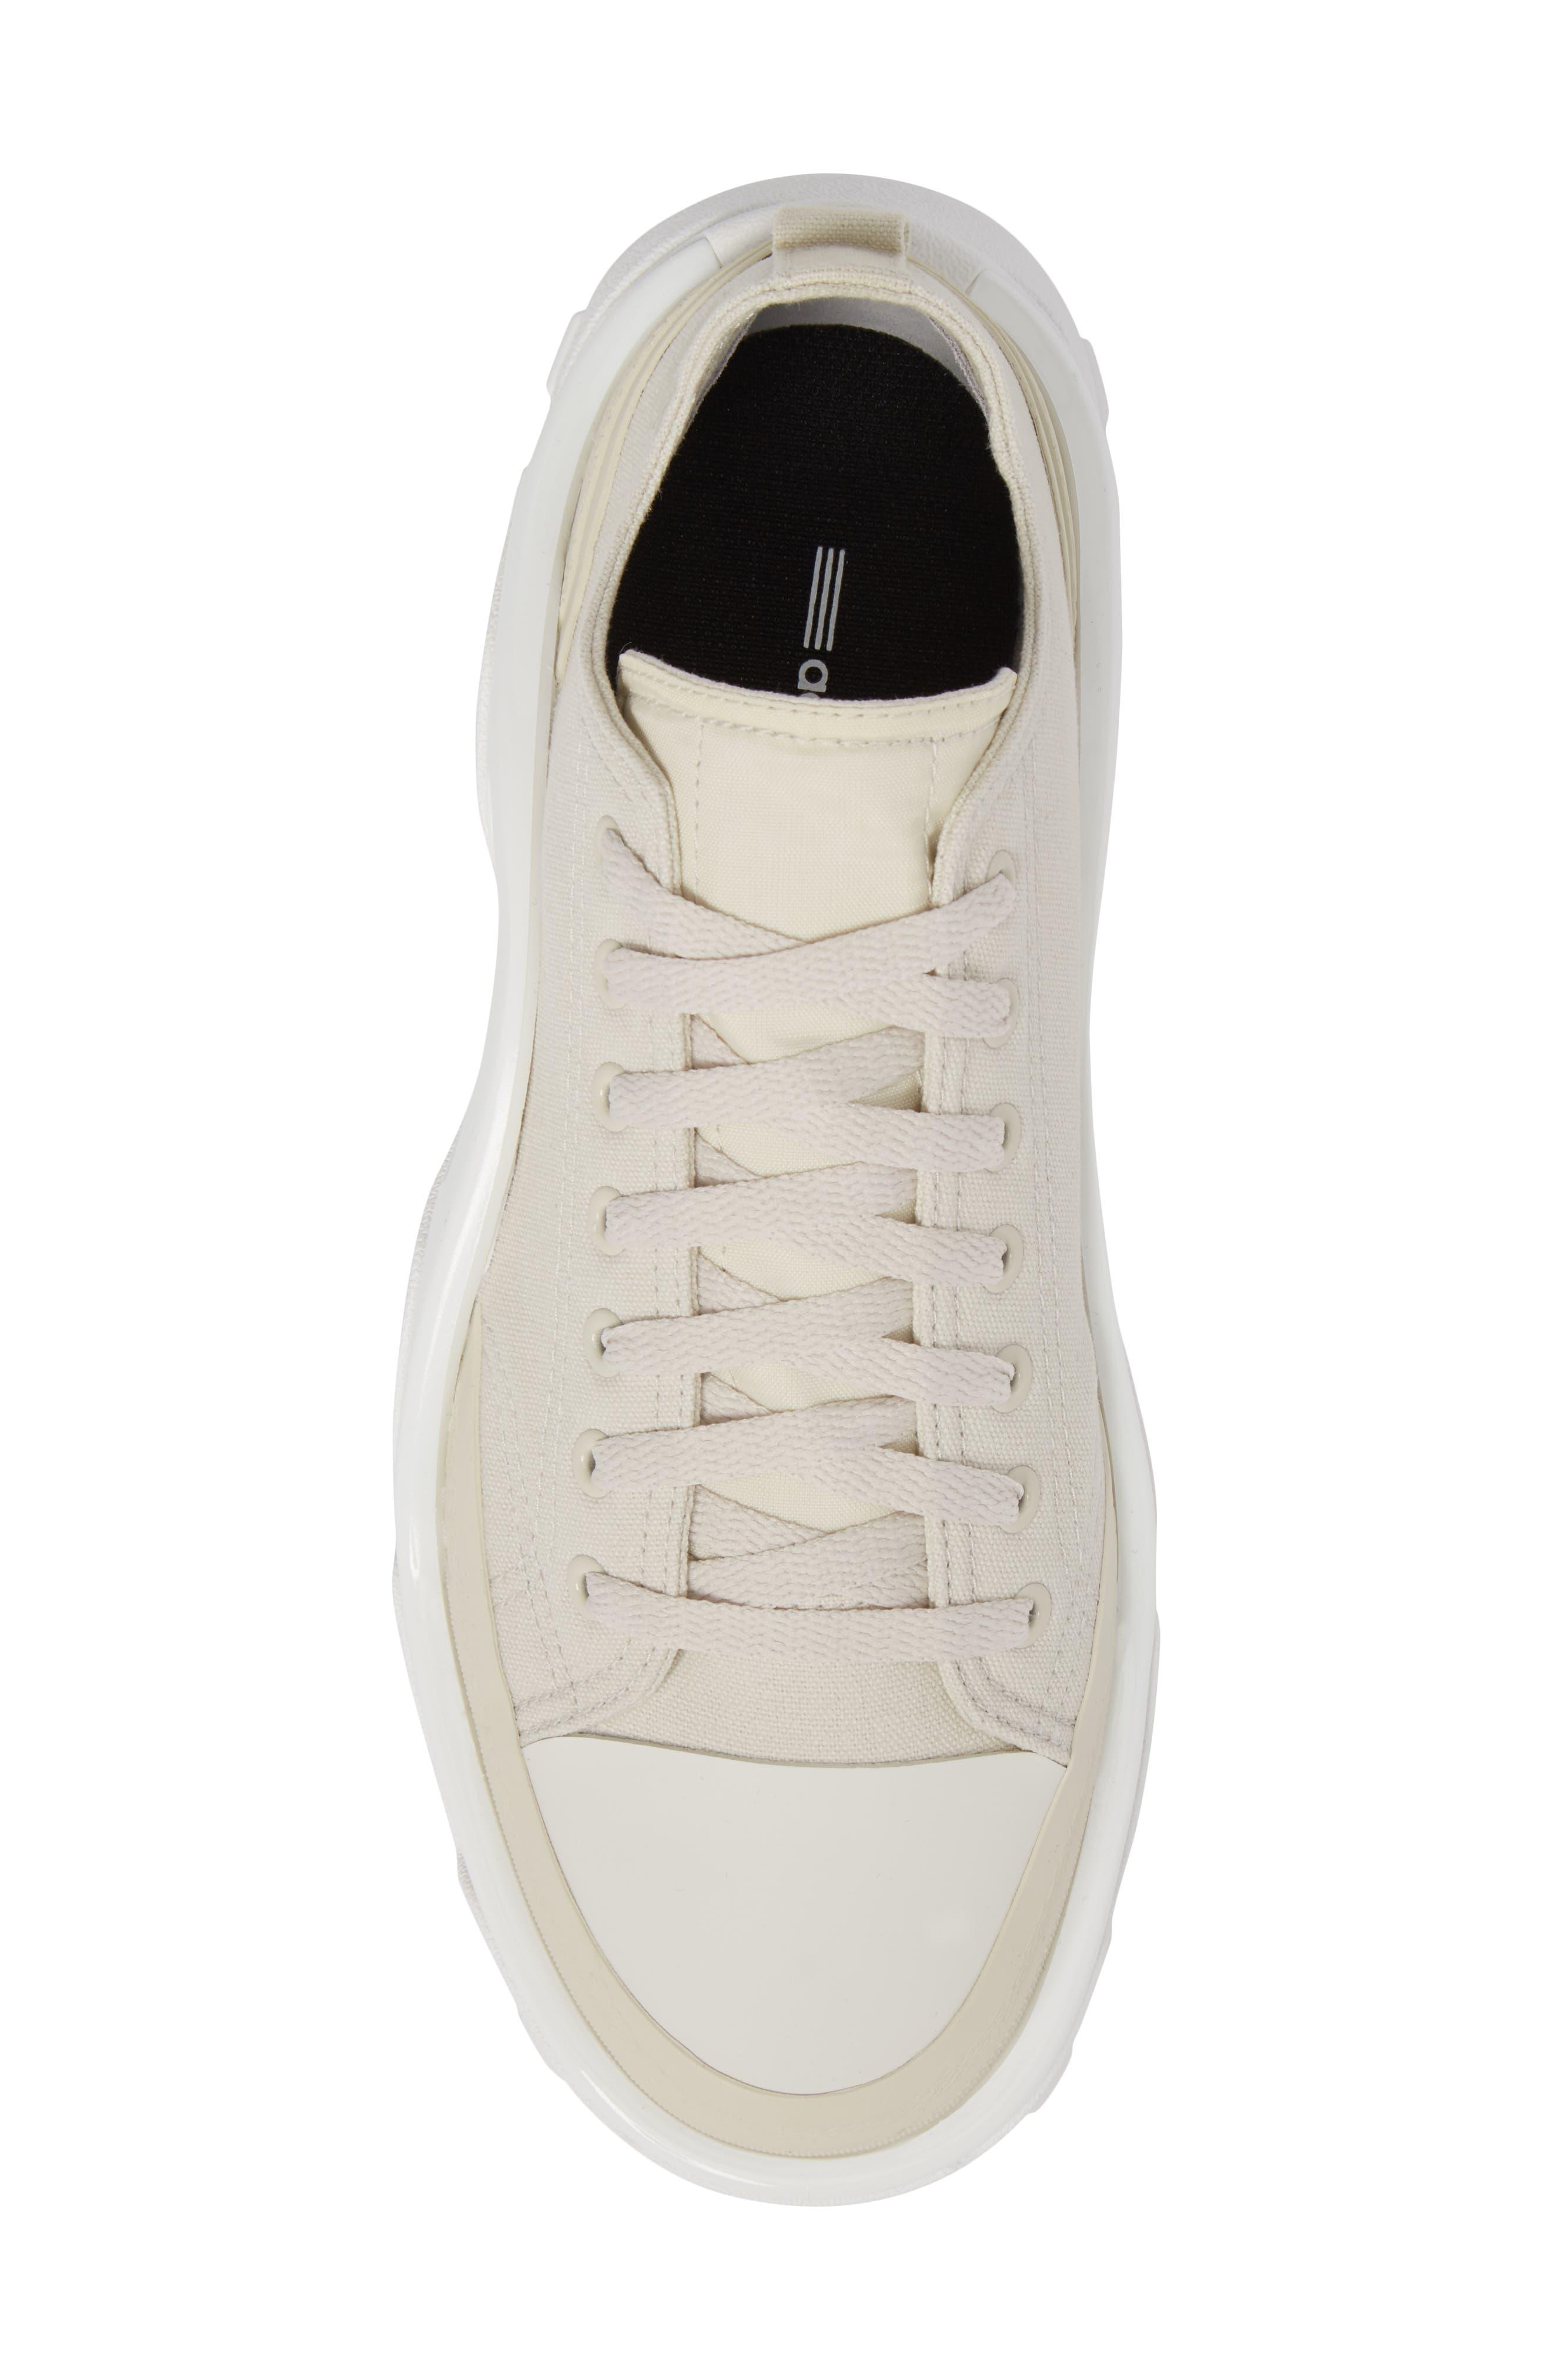 Detroit Low Top Sneaker,                             Alternate thumbnail 5, color,                             Beige/ White